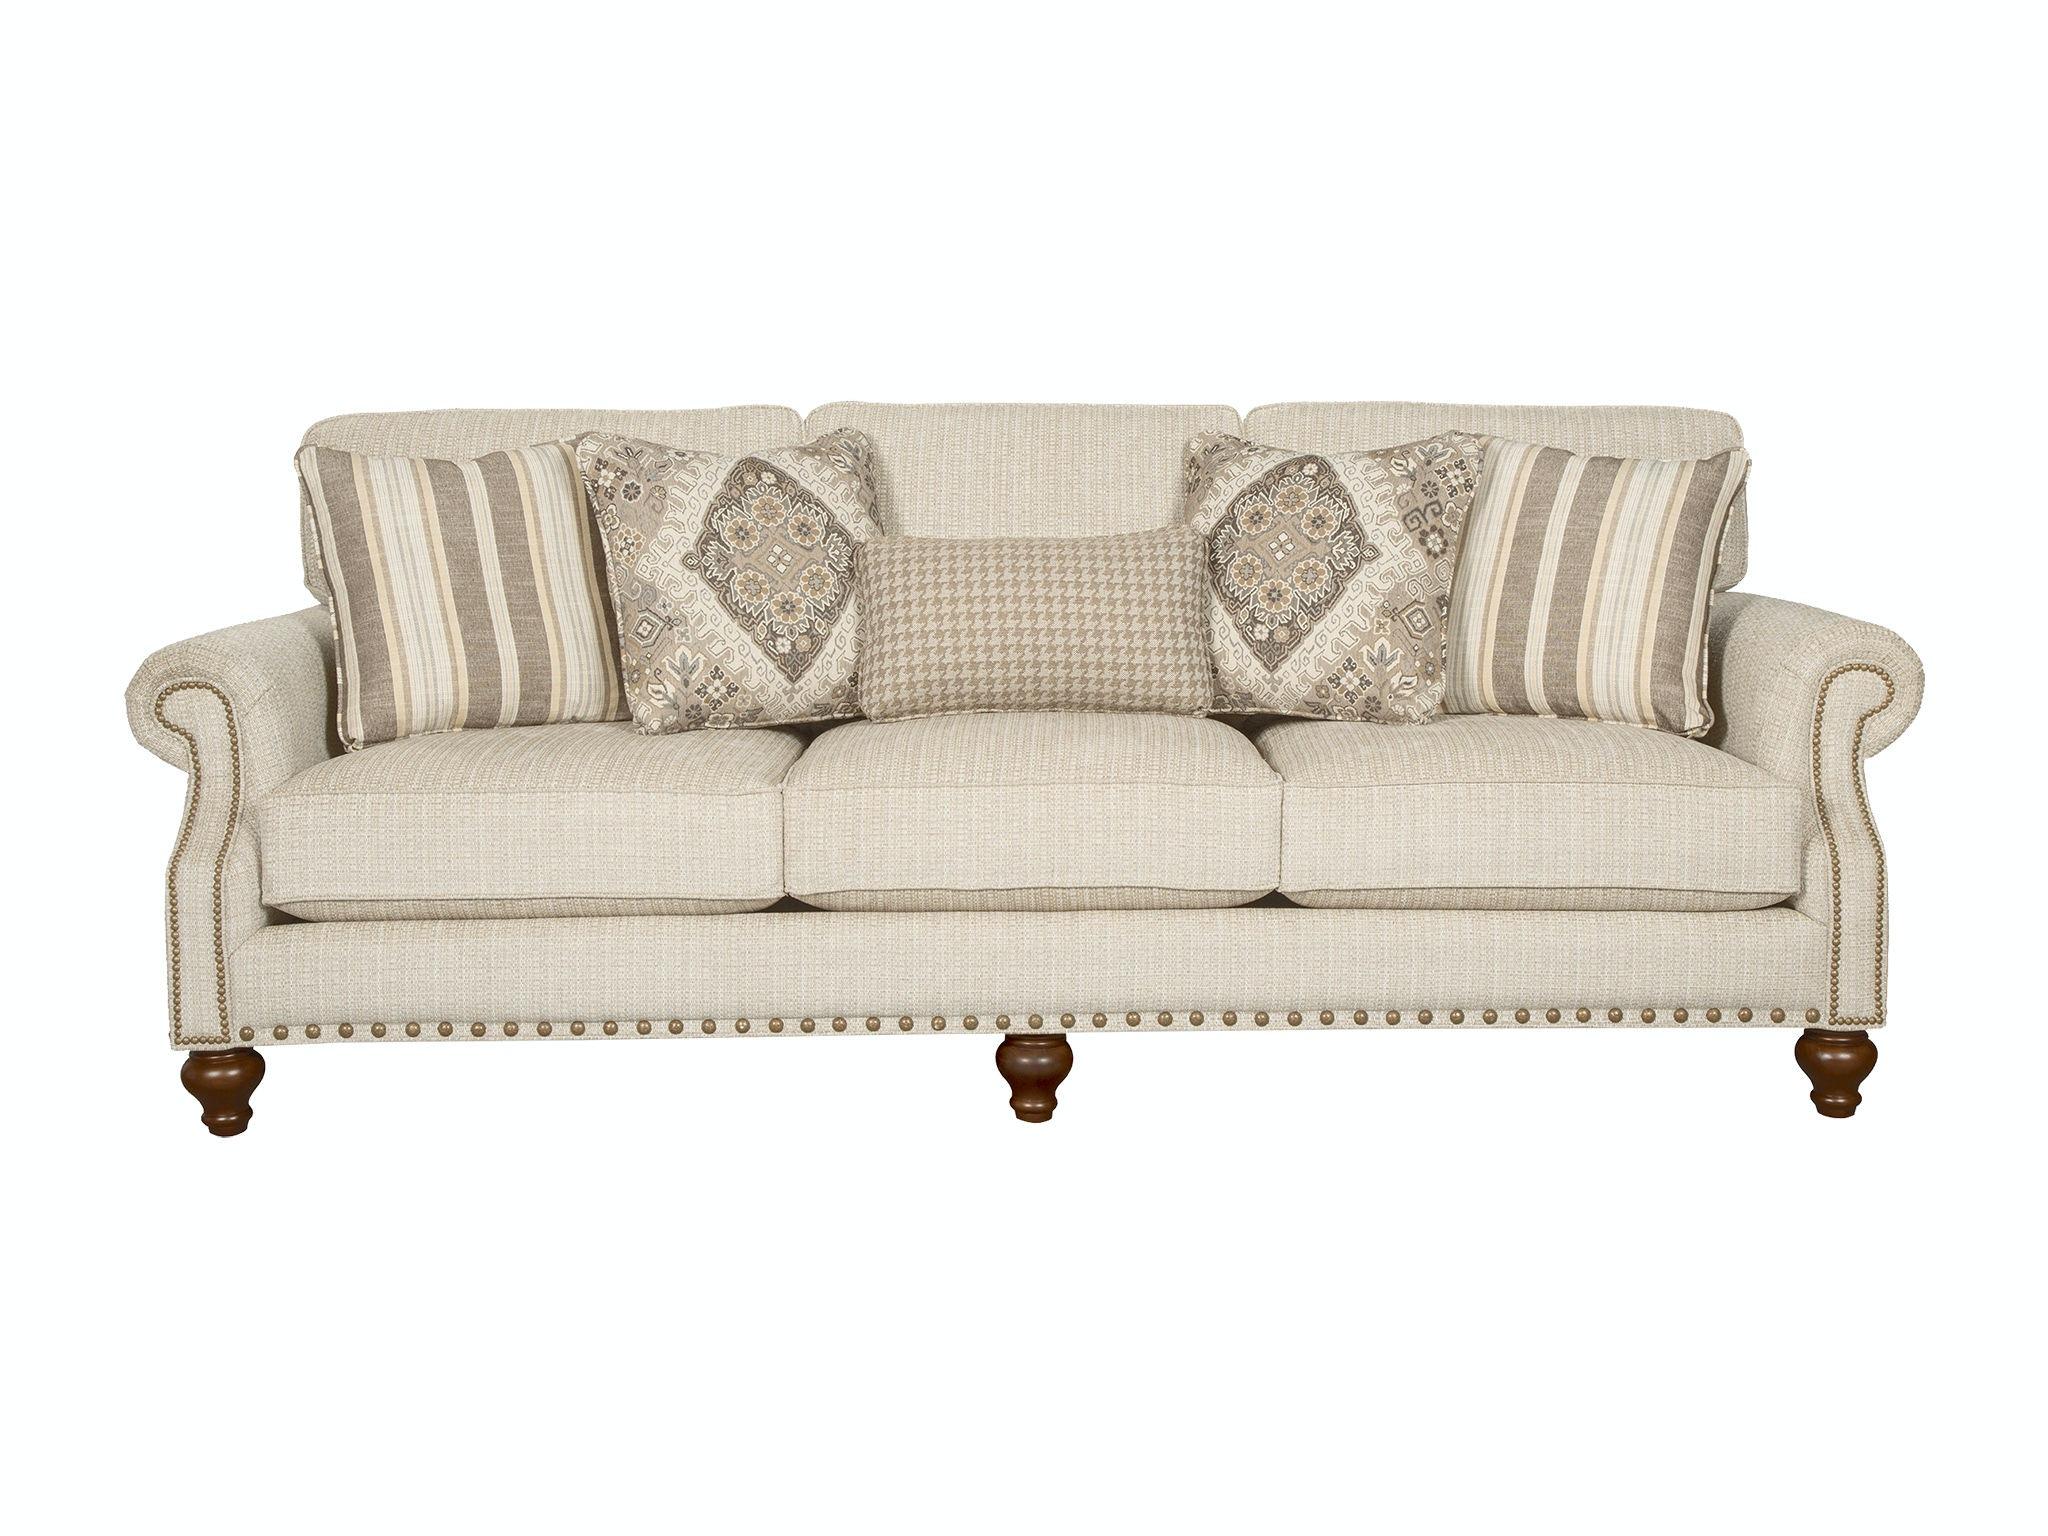 craftmaster living room furniture patterned drapes in sofa 762350 hiddenite nc